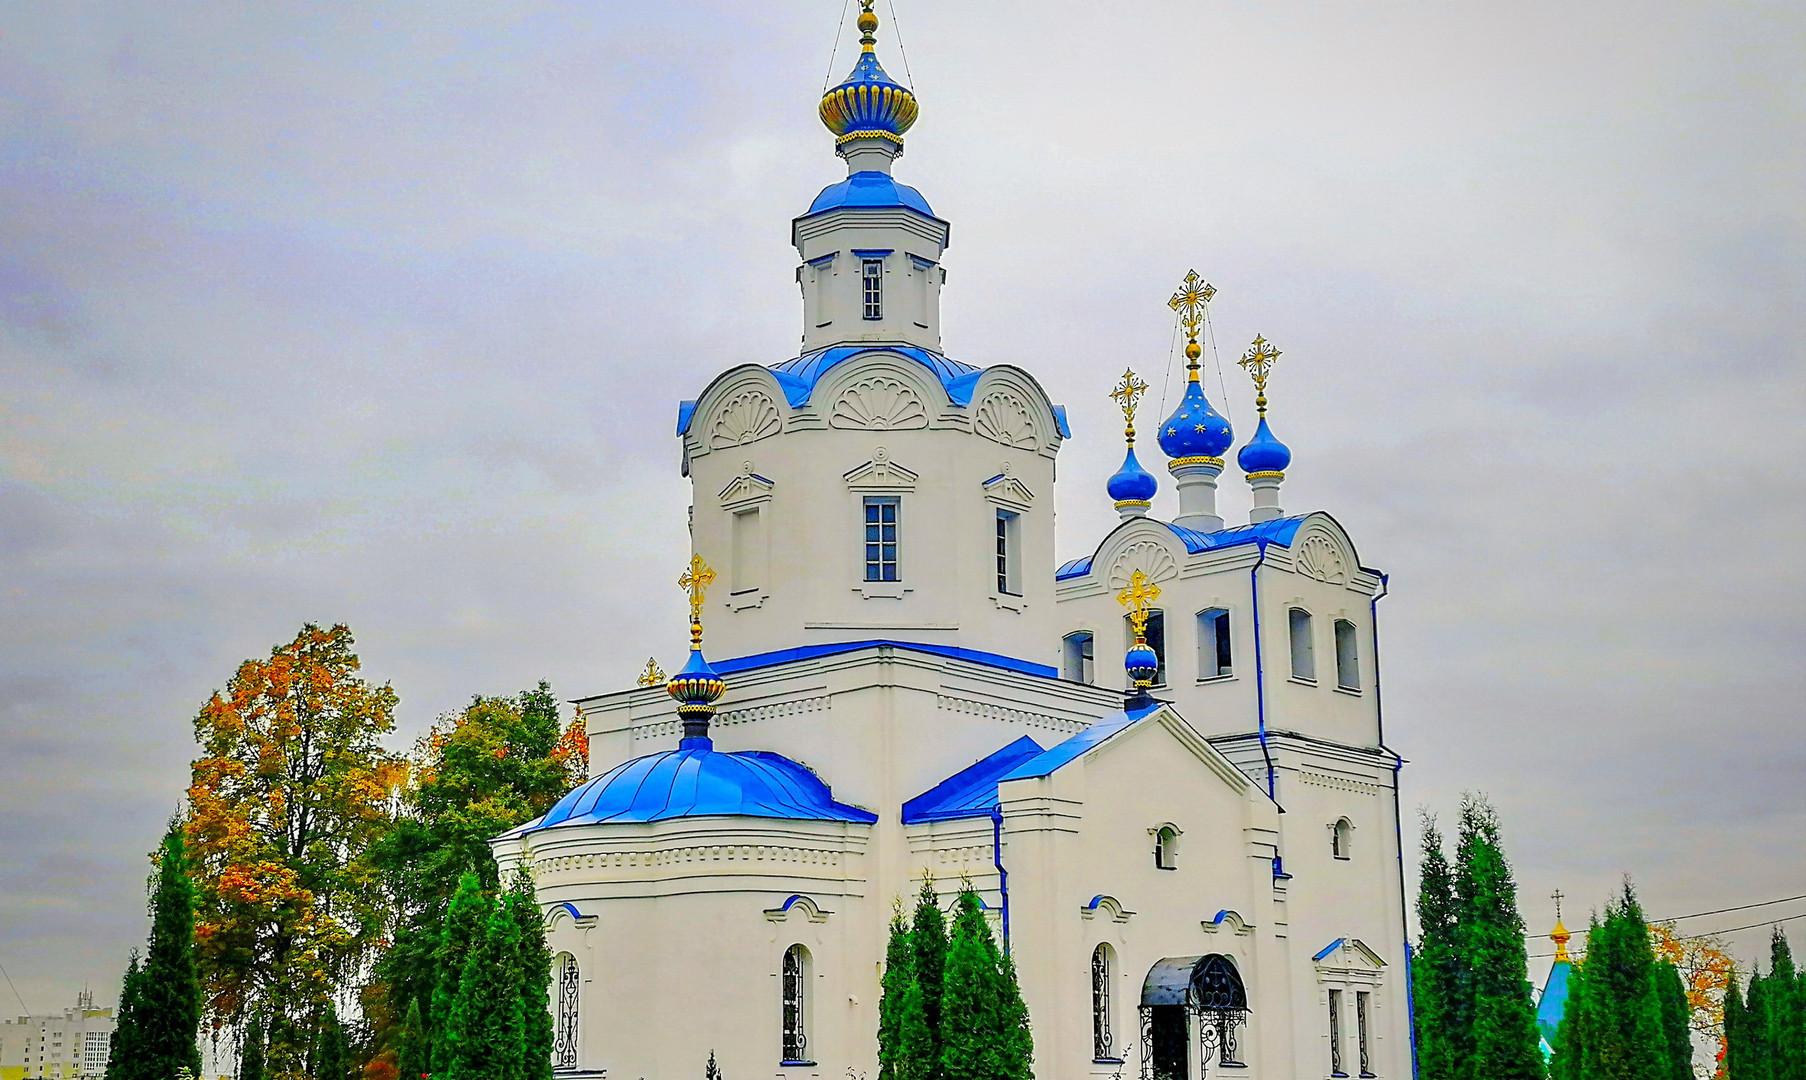 Свято-Успенский монастырь, Орёл